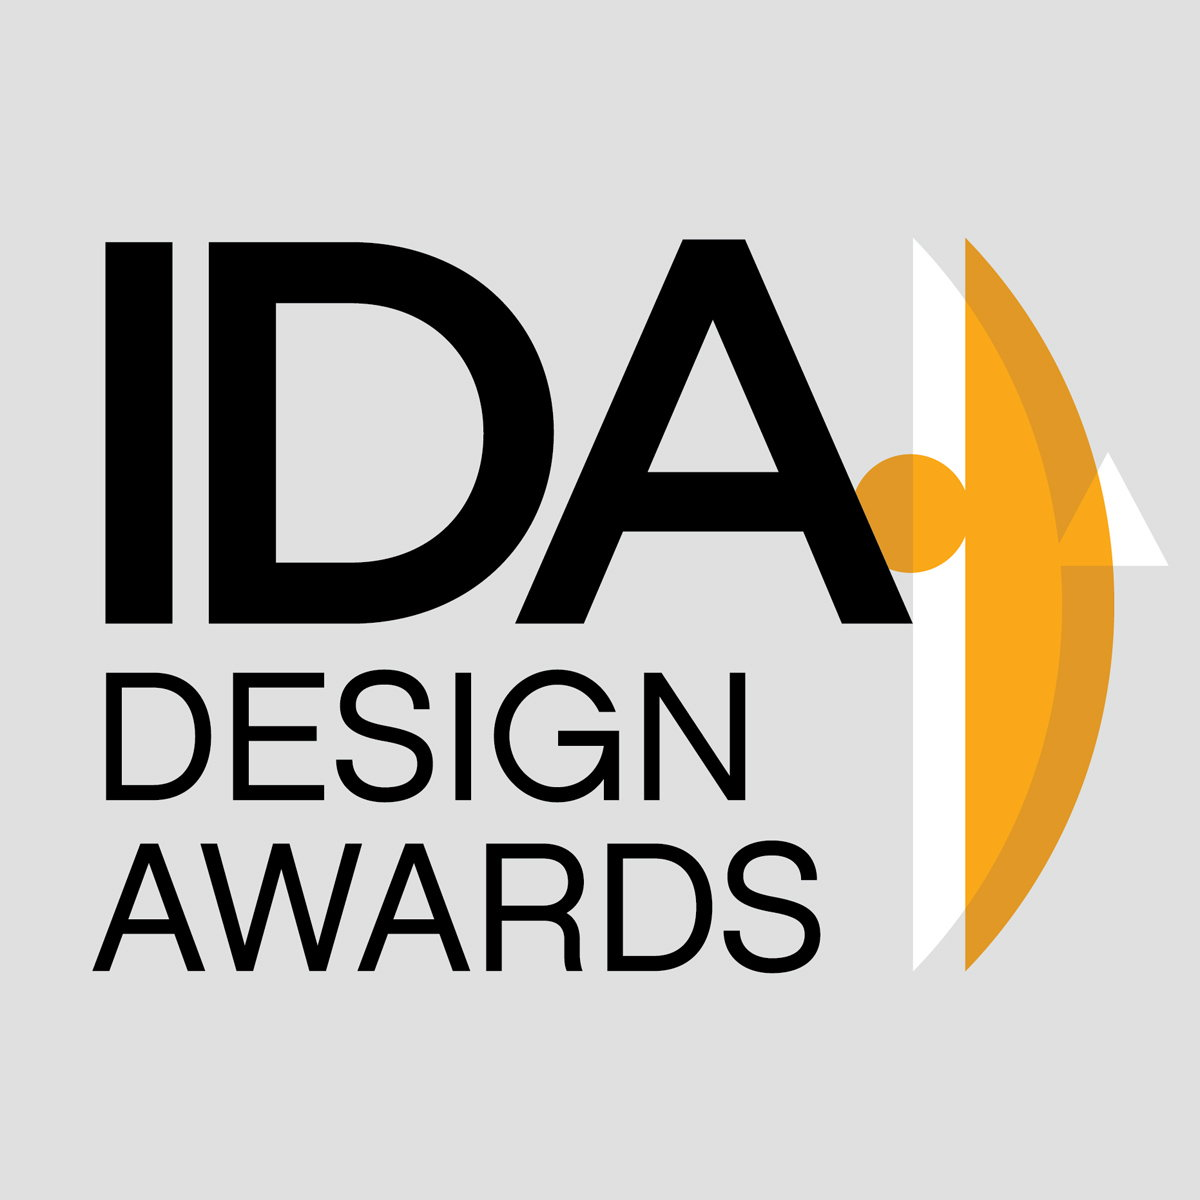 15th Annual International Design Awards